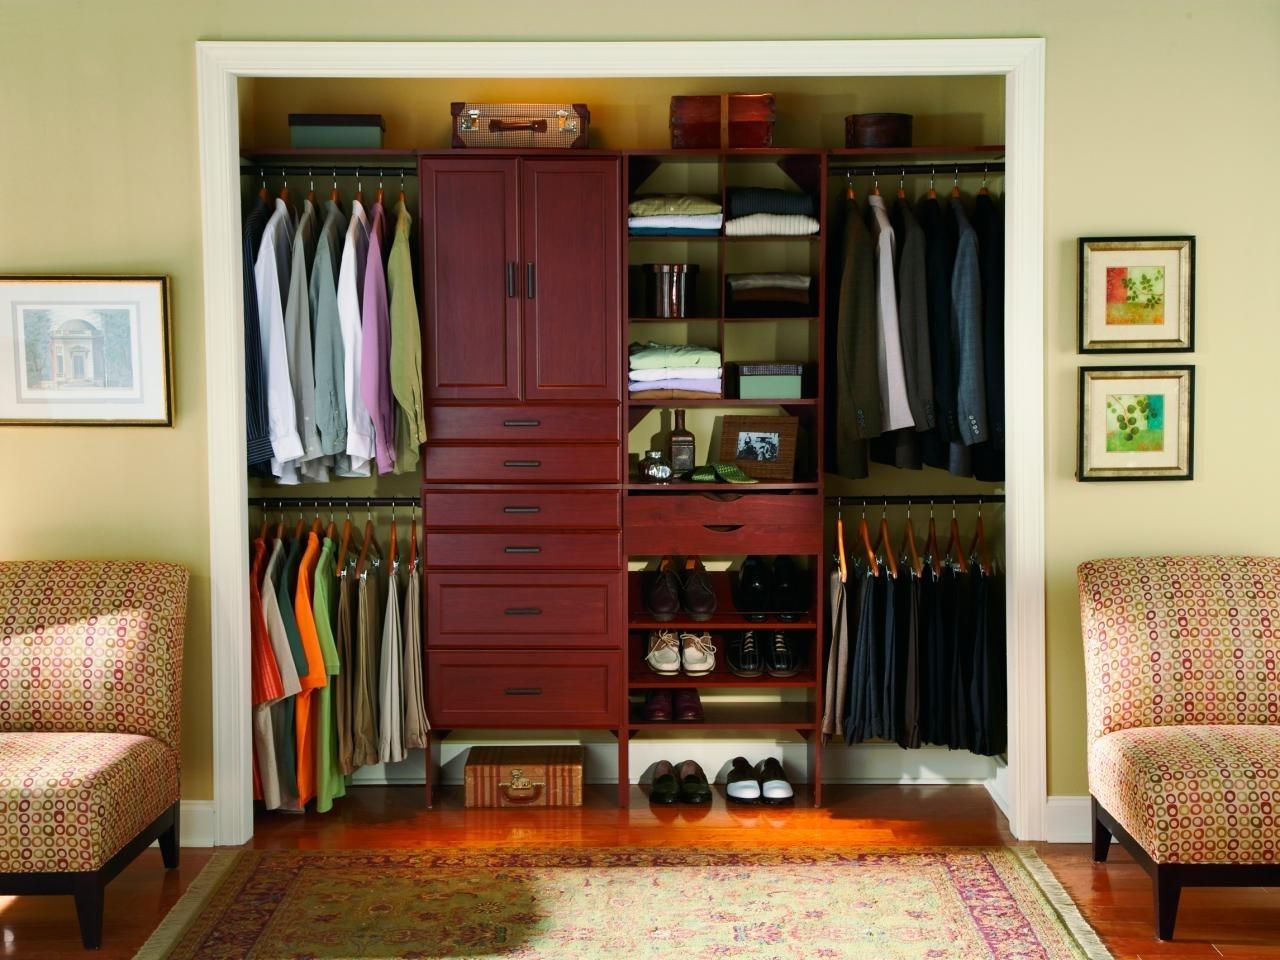 10 Attractive Closet Organization Ideas For Small Closets %name 2021